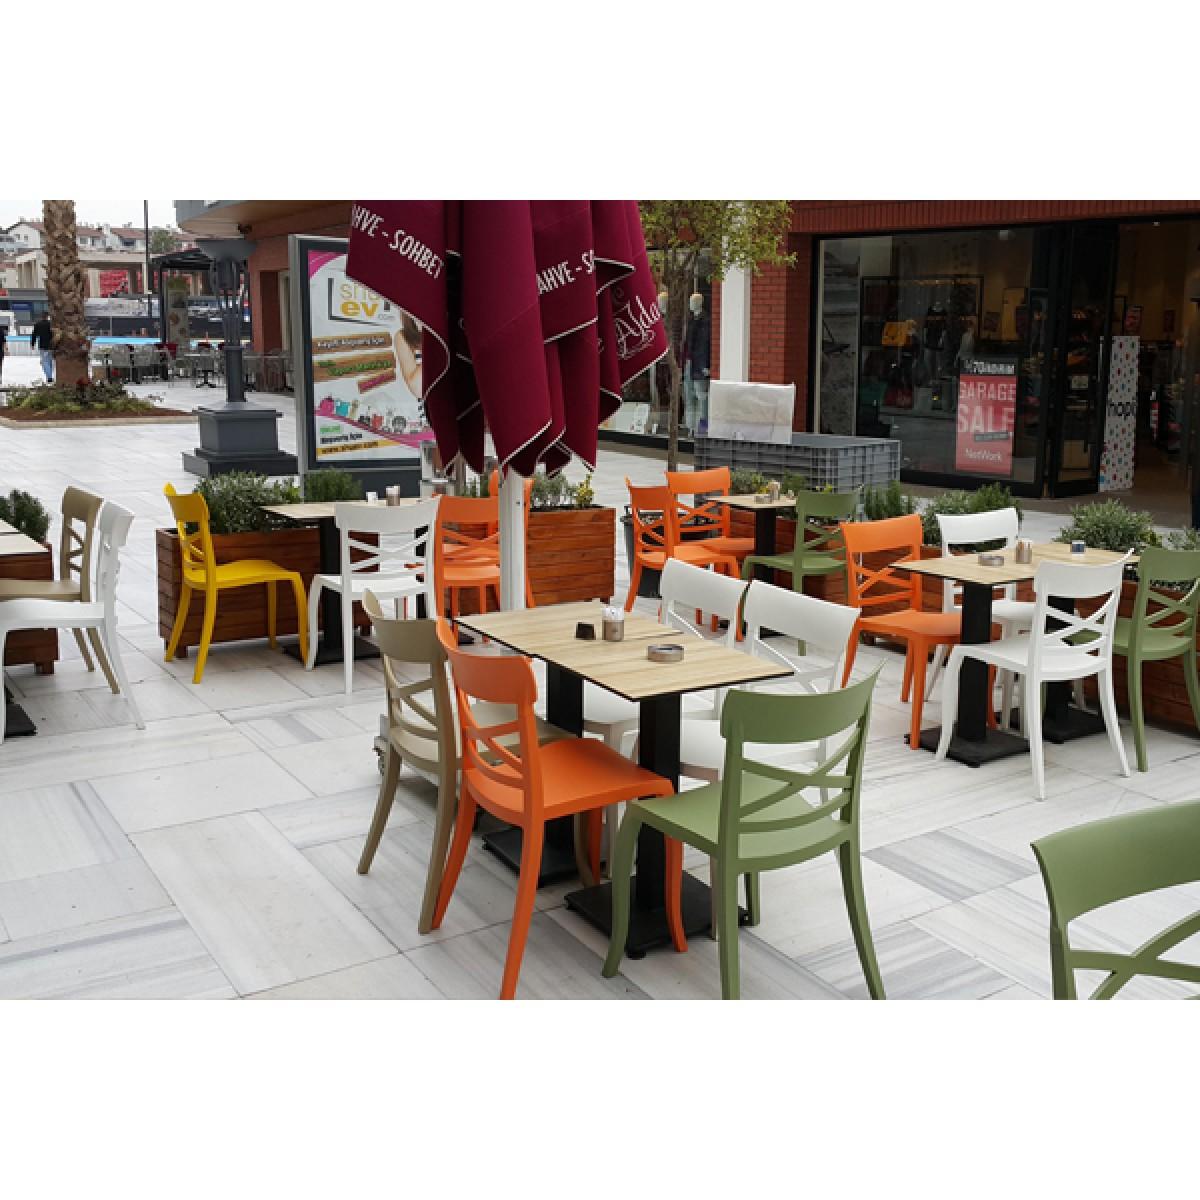 gartenstuhl gelb stapelbar stuhl outdoor gelb kunststoff. Black Bedroom Furniture Sets. Home Design Ideas